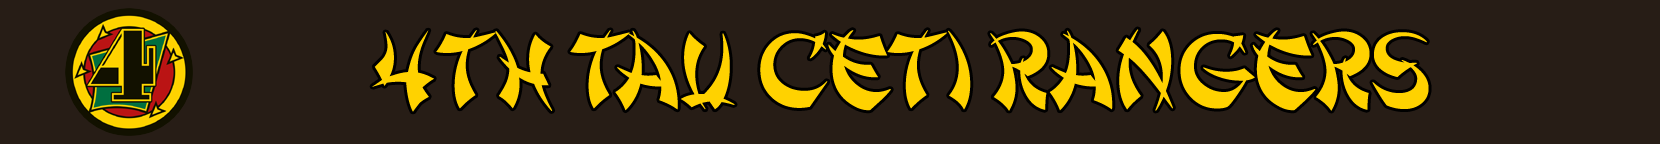 4 TCRbanner9